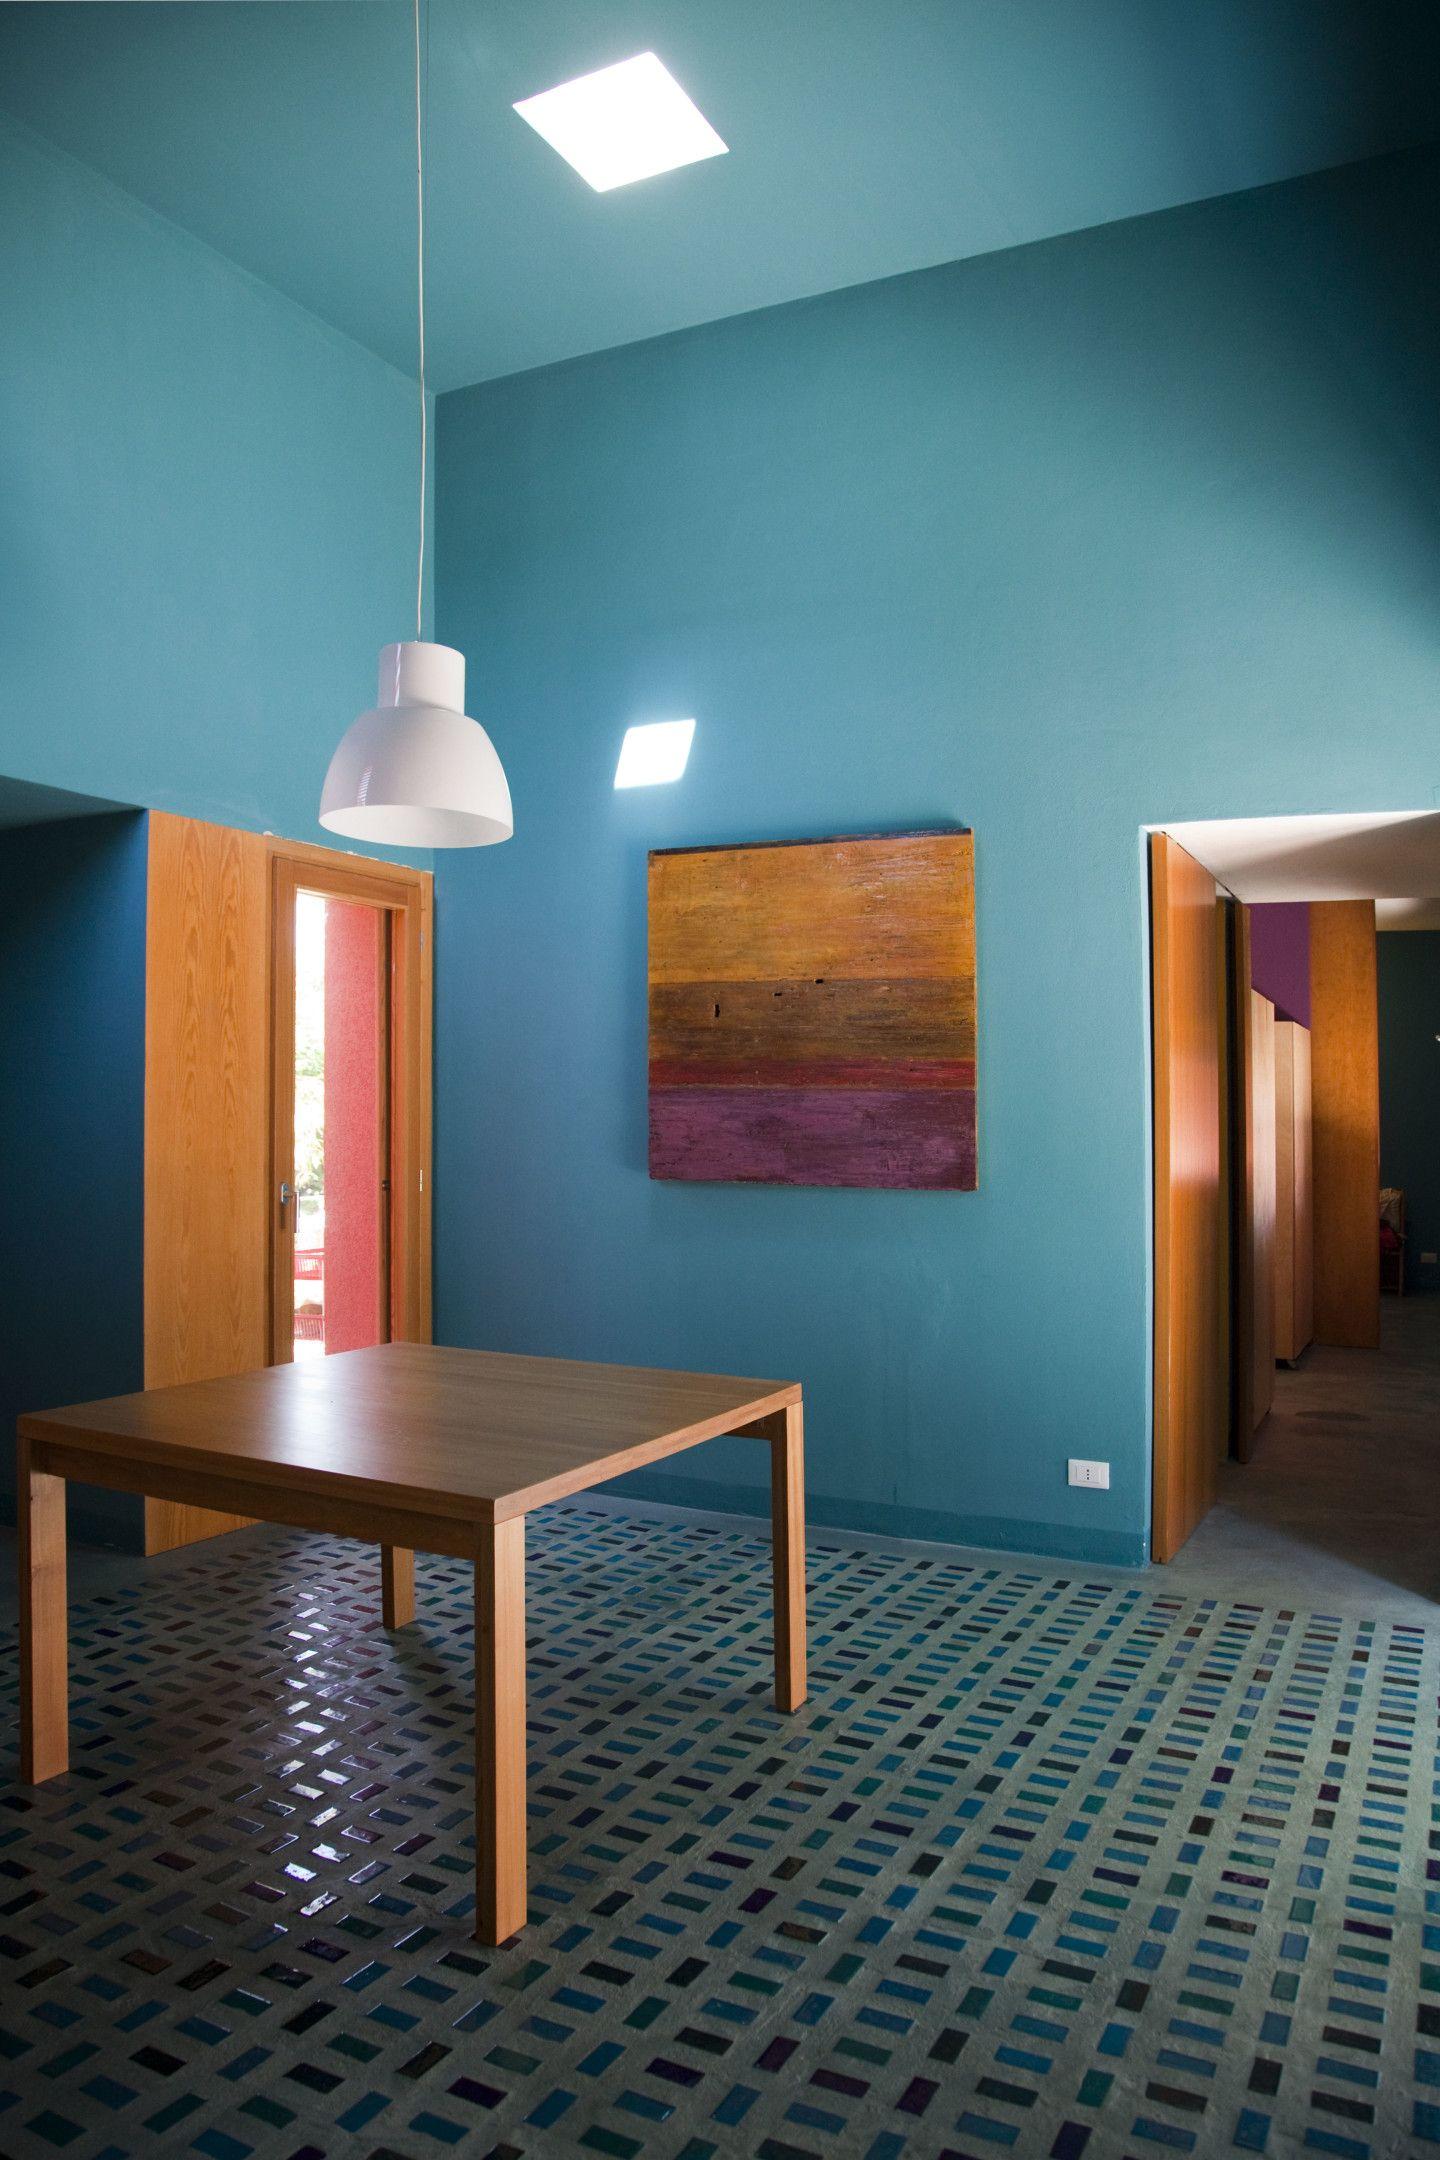 Bruno Messina, Francesco Infantino · Piccola casa per